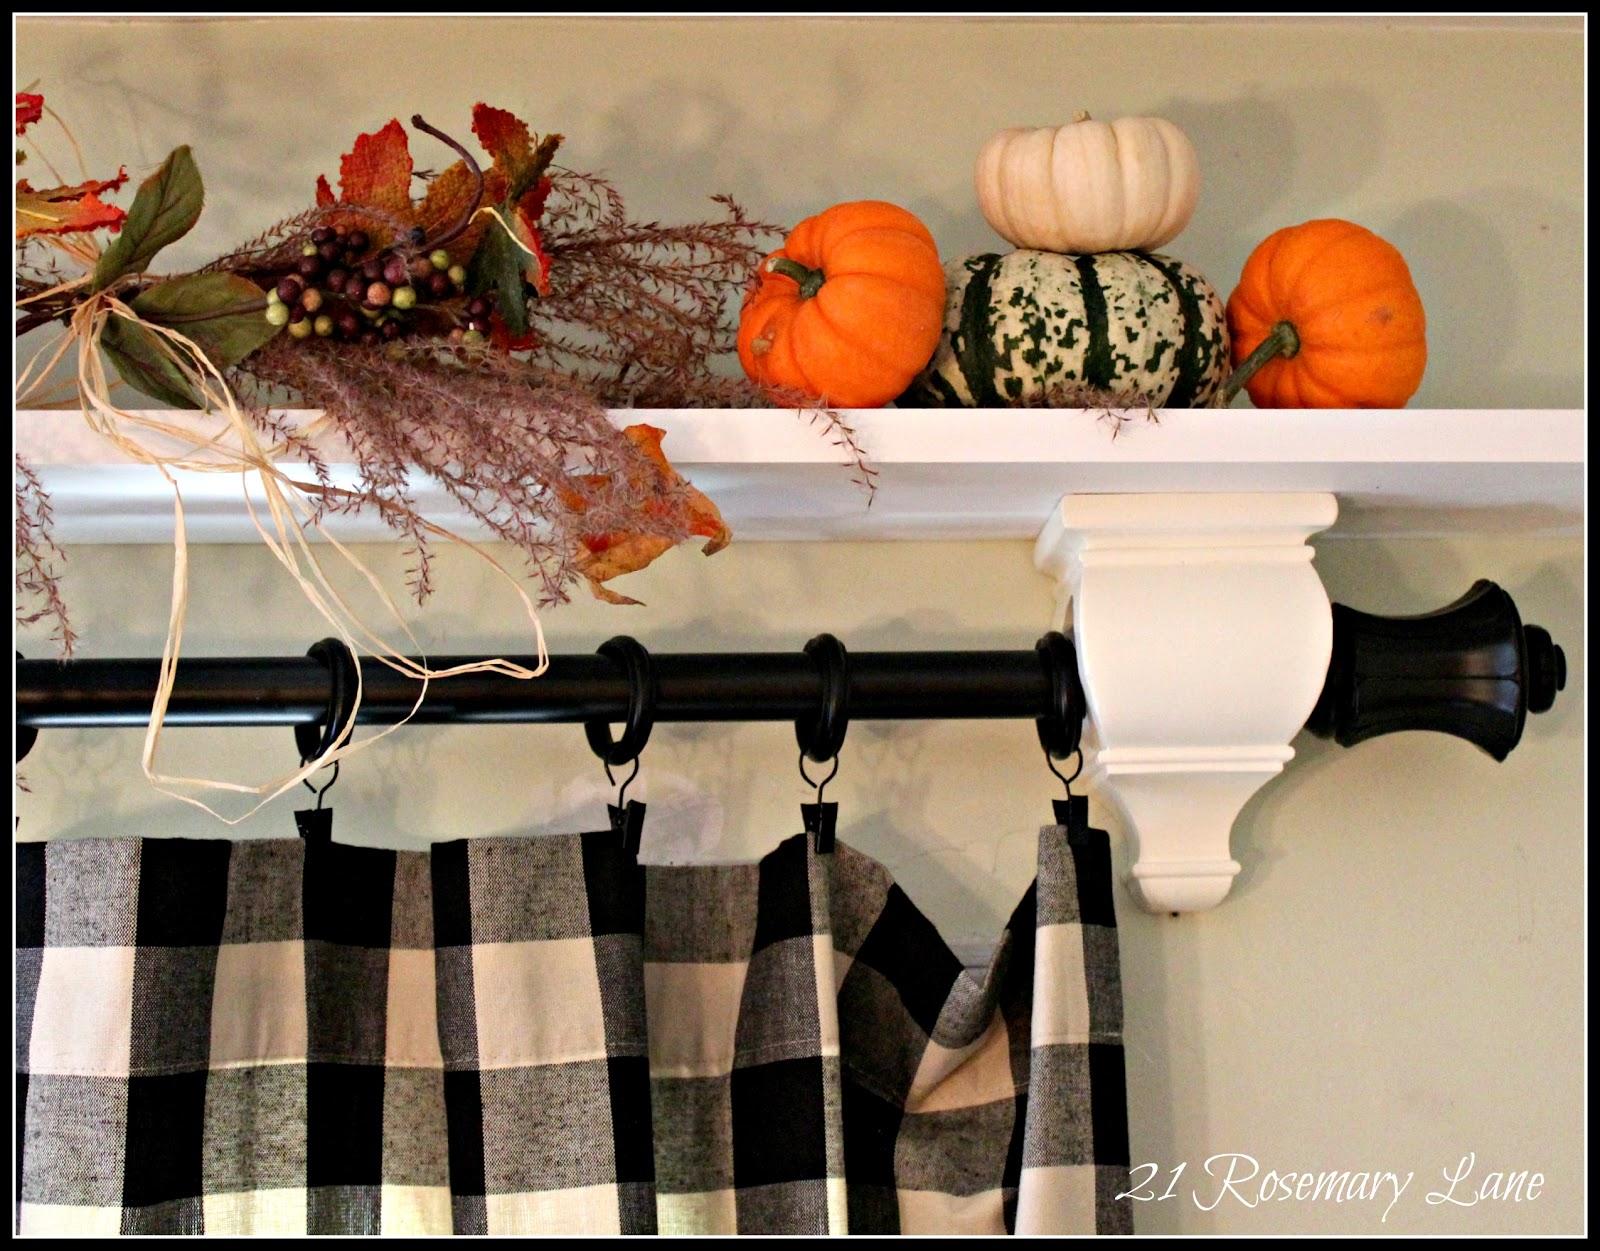 21 Rosemary Lane: Easy + Decorative Over-the-Door Shelf